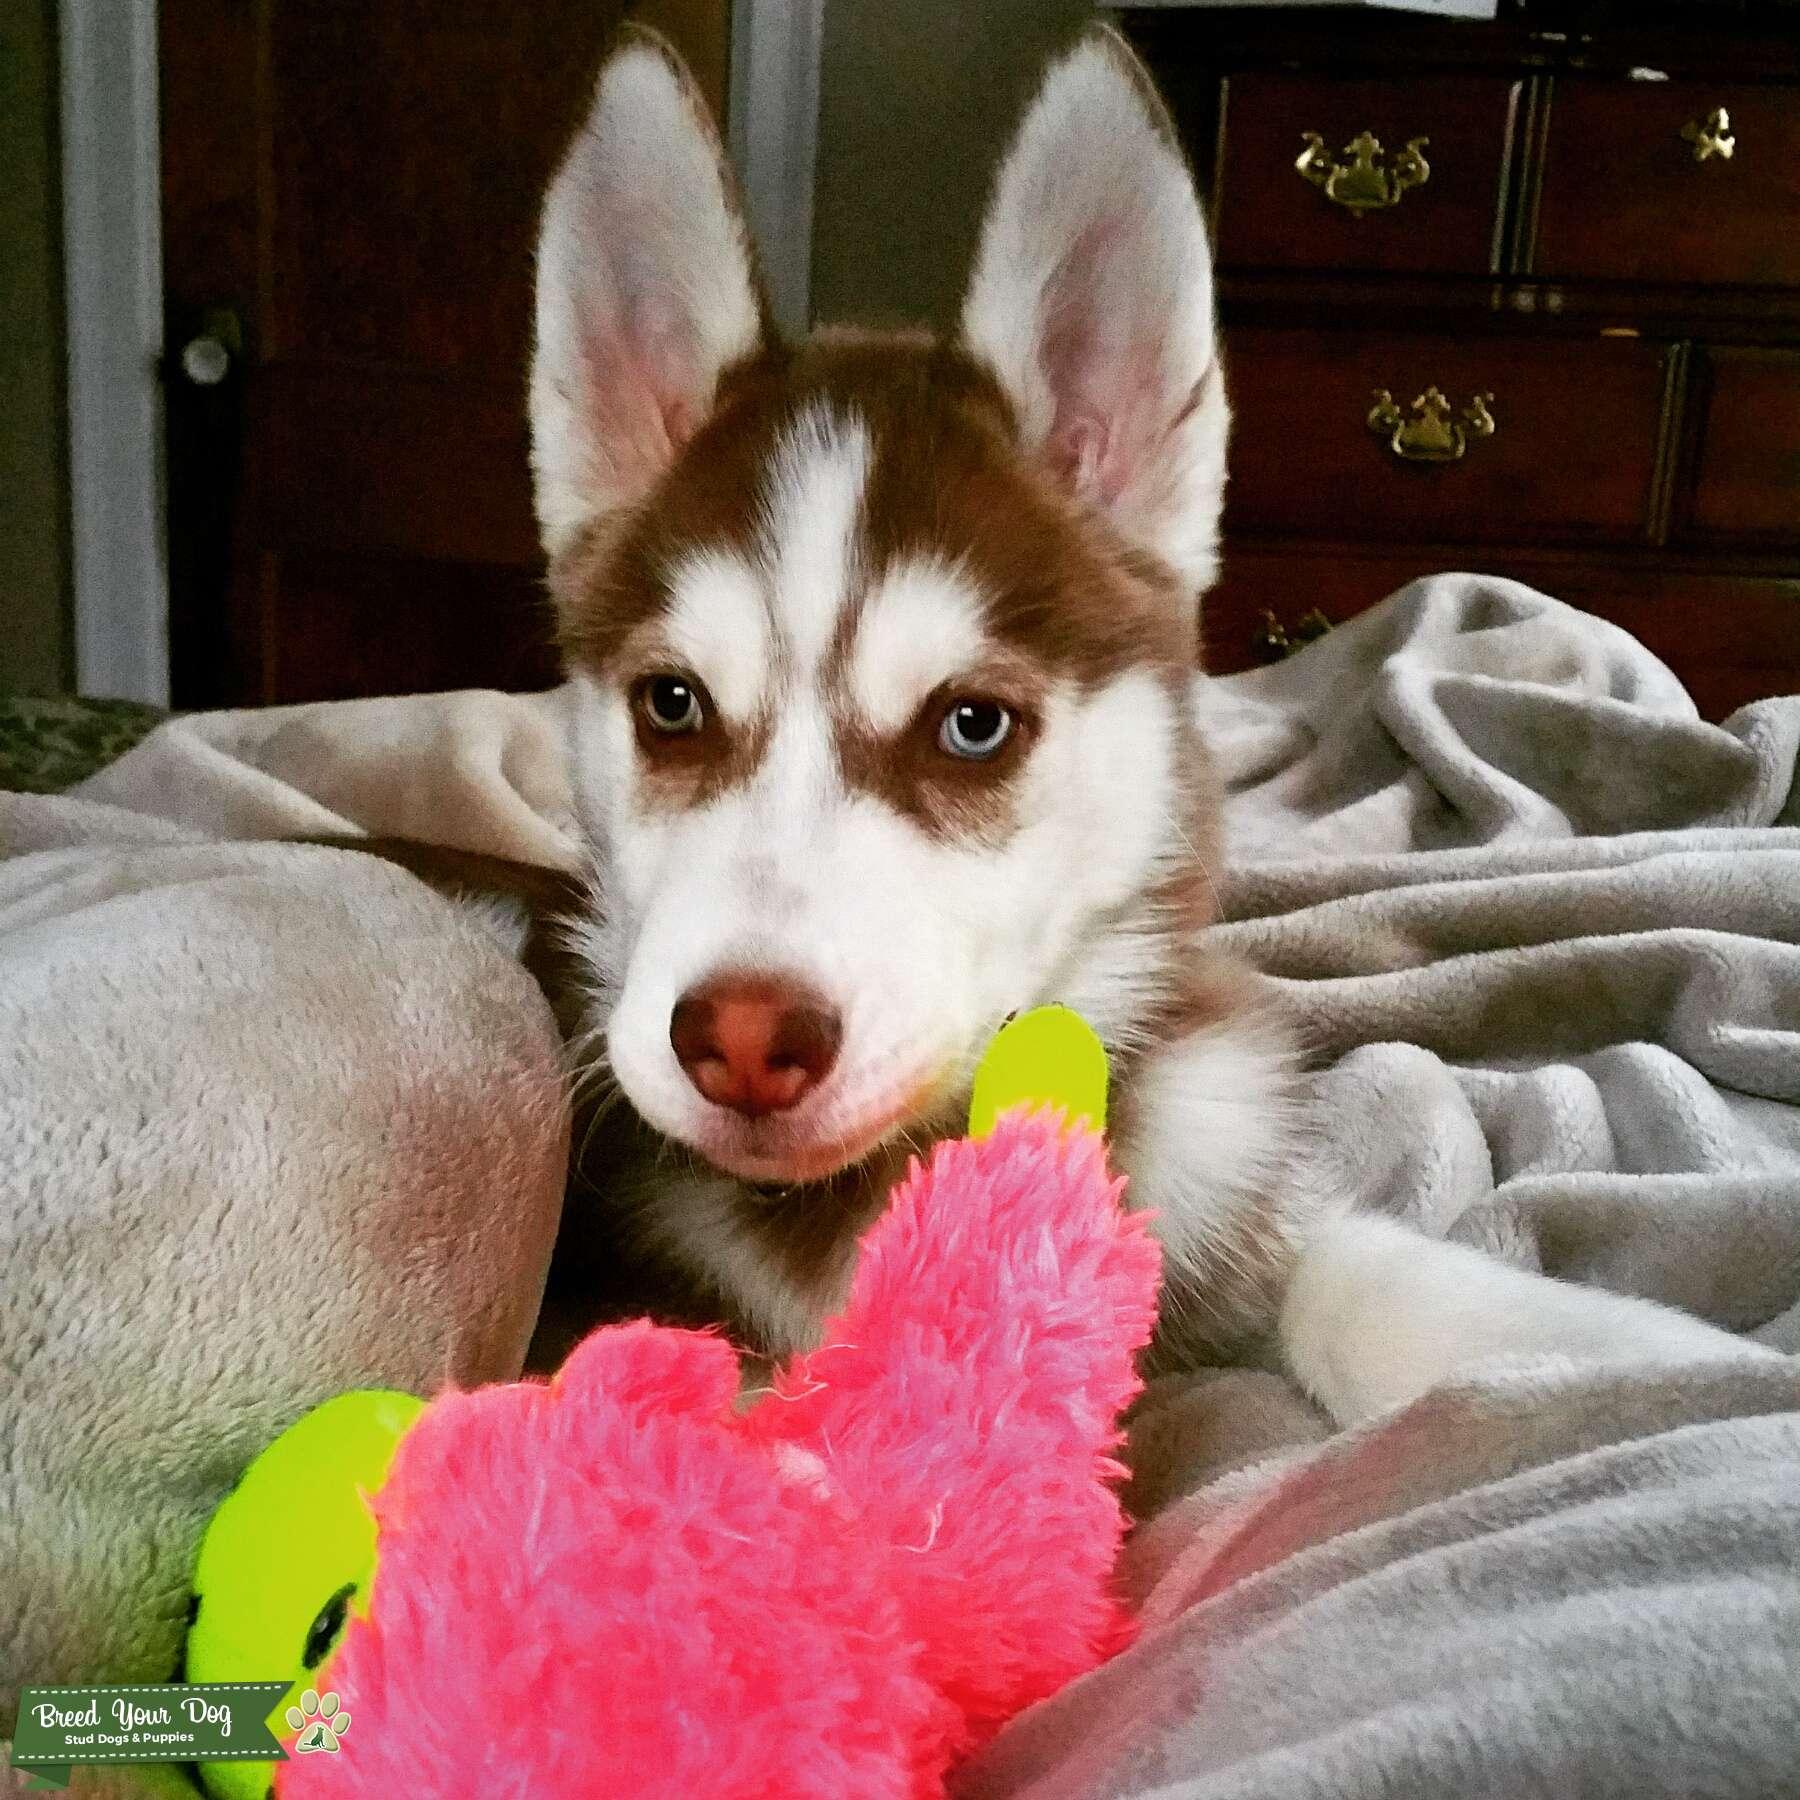 Stud Dog - CKC Registered Rare-Eyed Siberian Husky - Breed